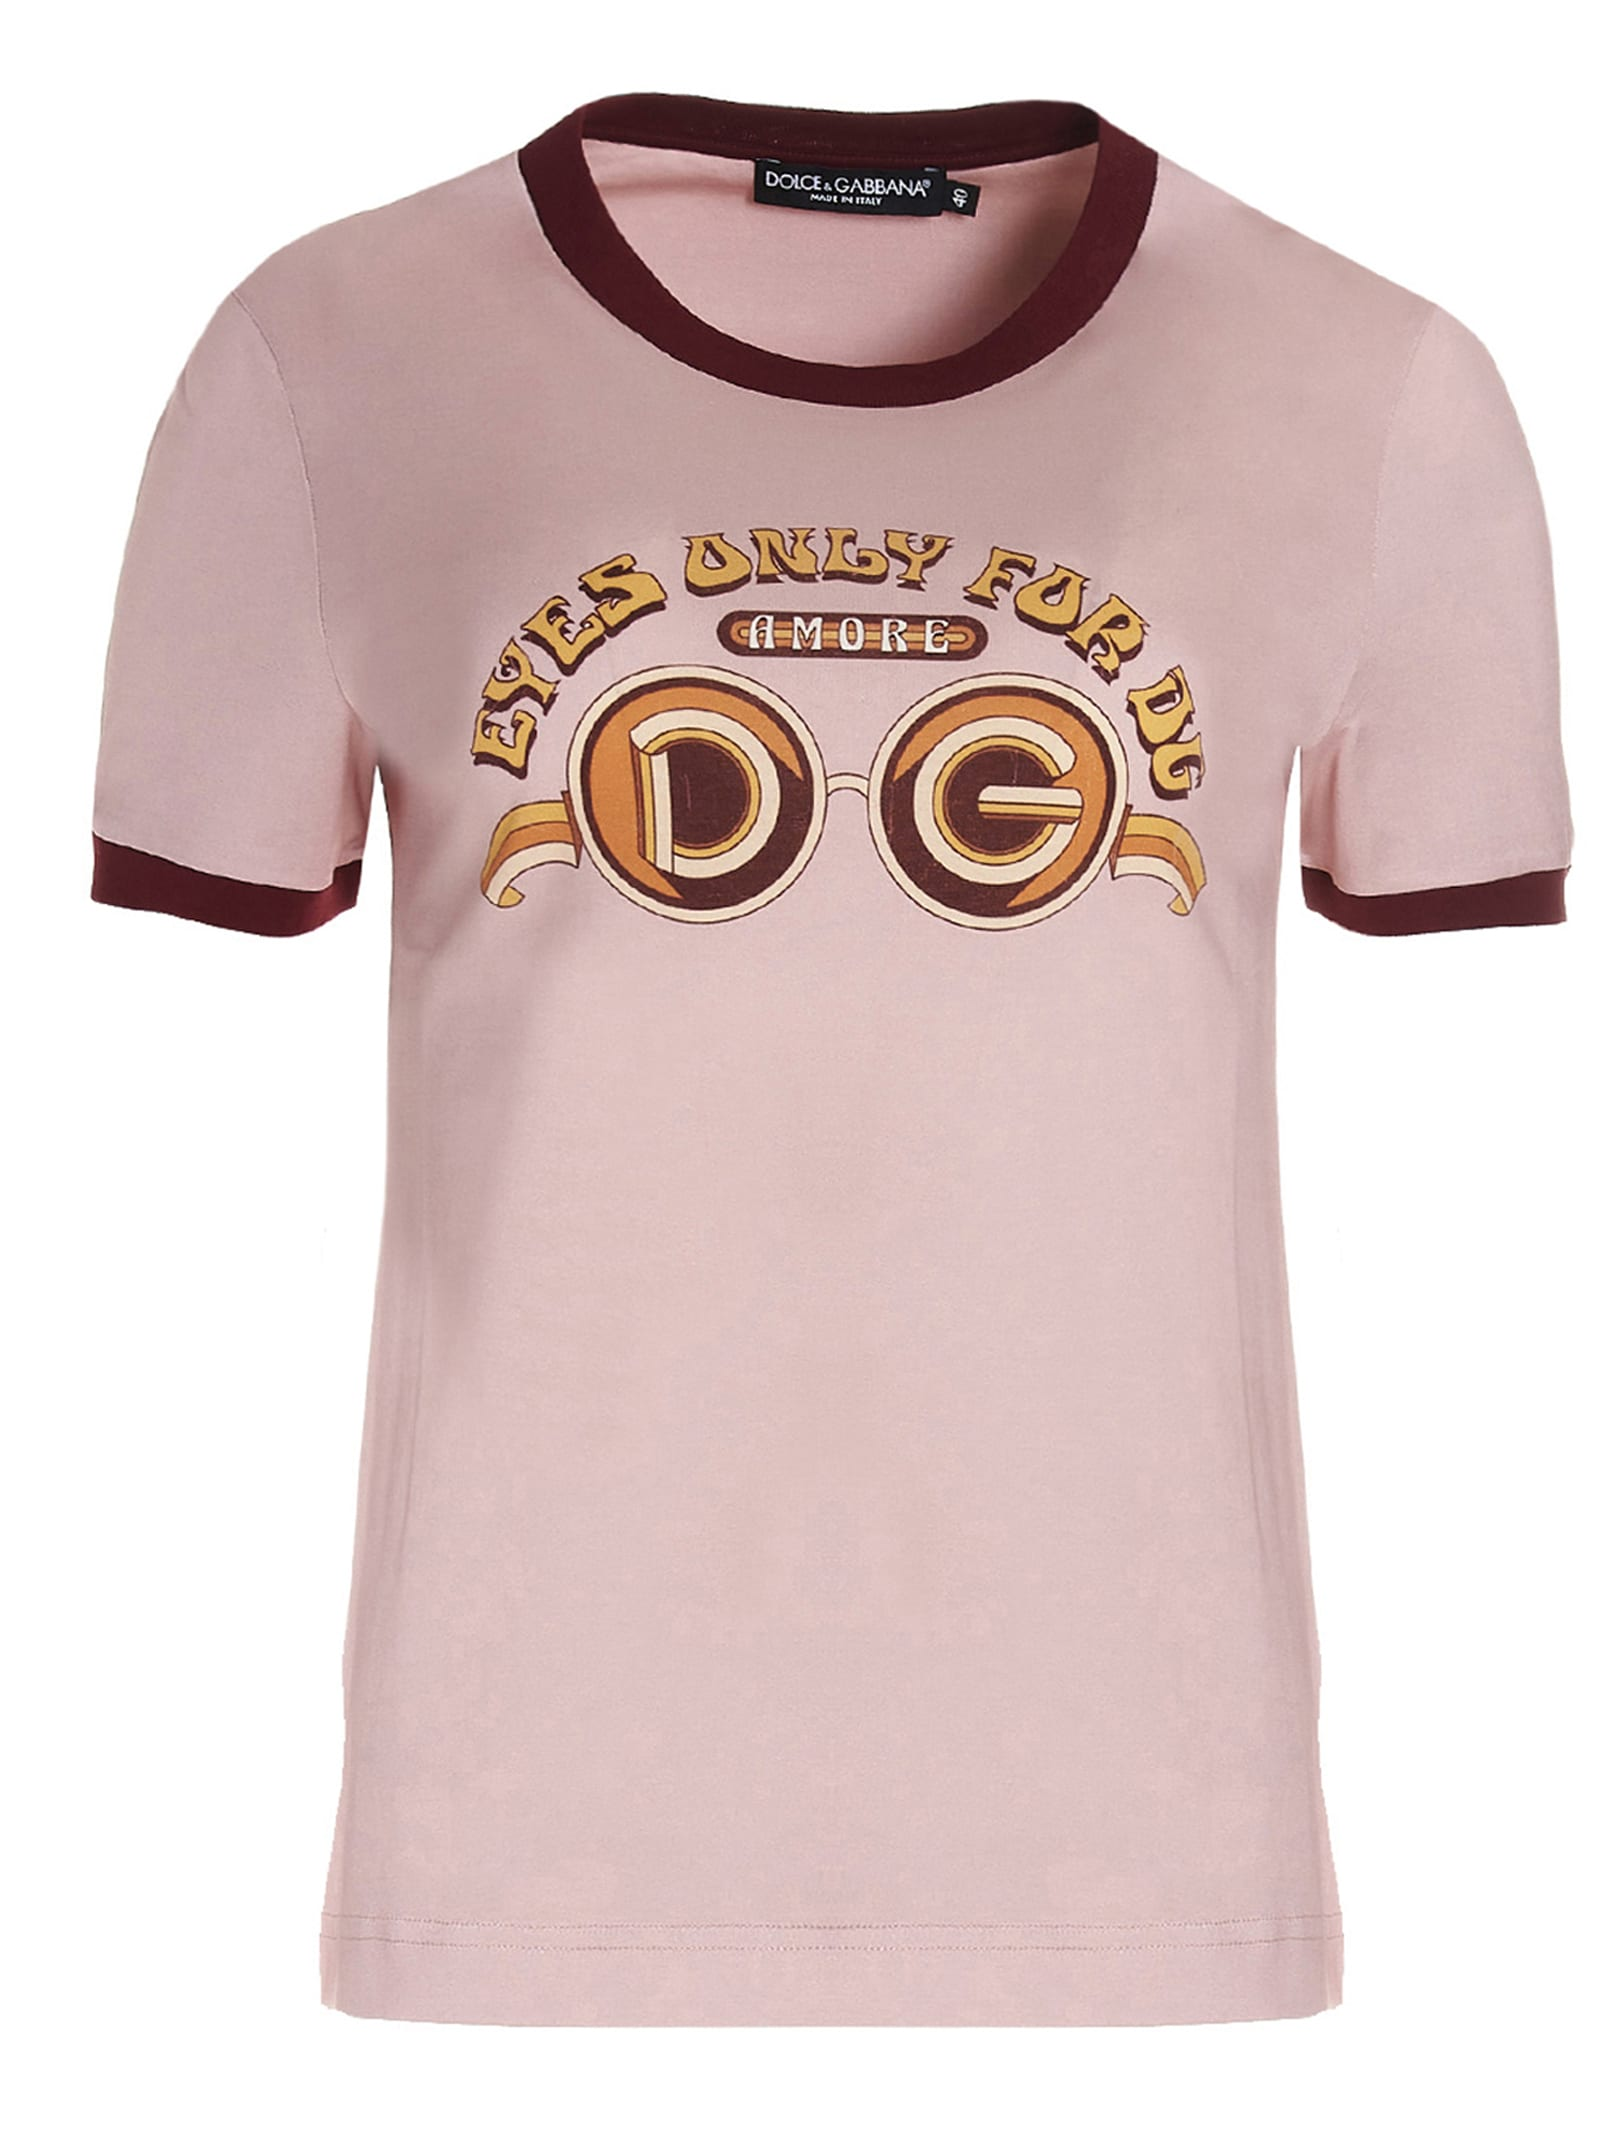 Dolce & Gabbana Tops T-SHIRT